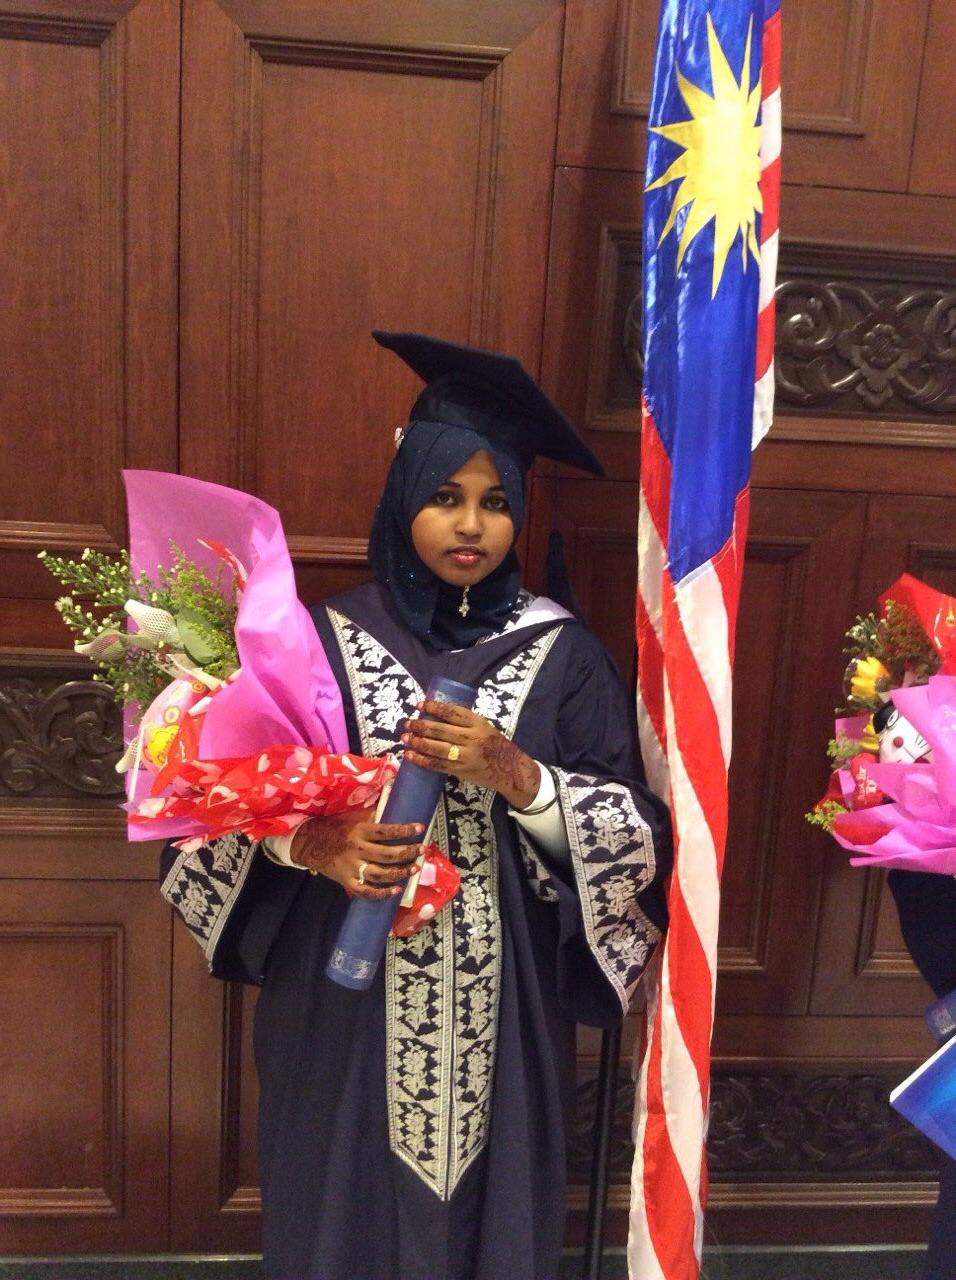 SIMAD University Condolence Message to Saturday's Deadly Attack